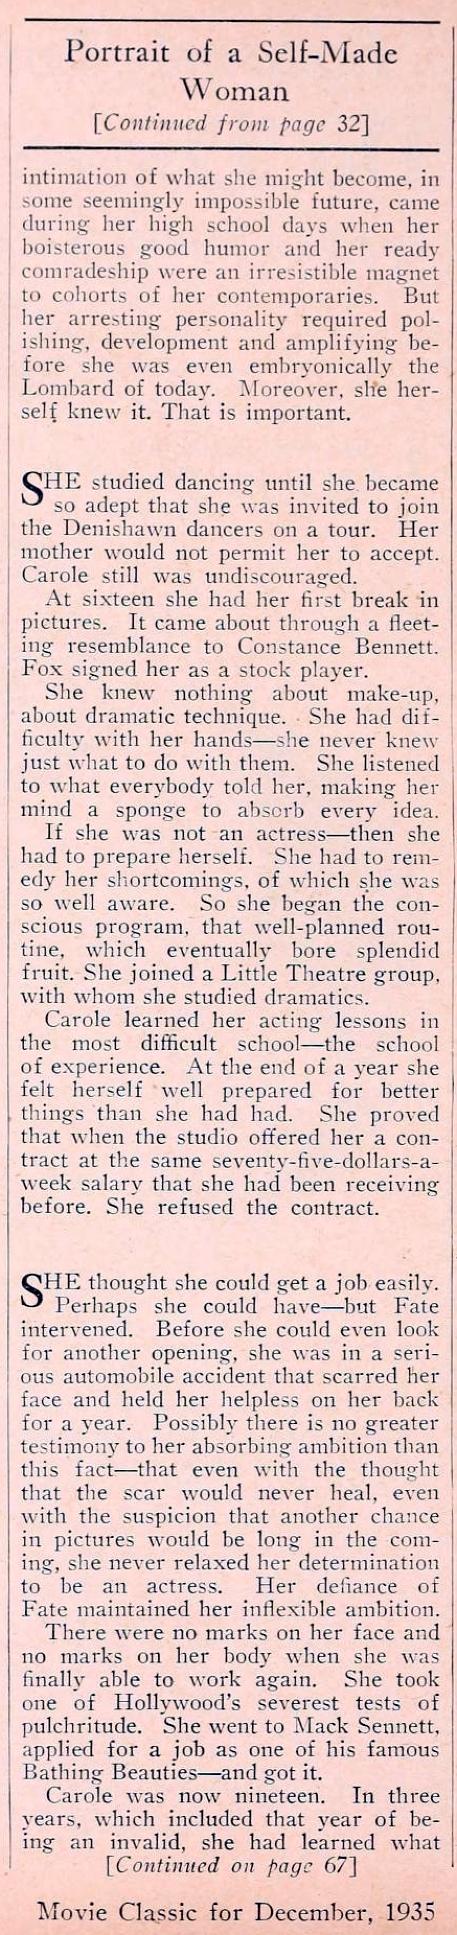 carole lombard movie classic december 1935ba